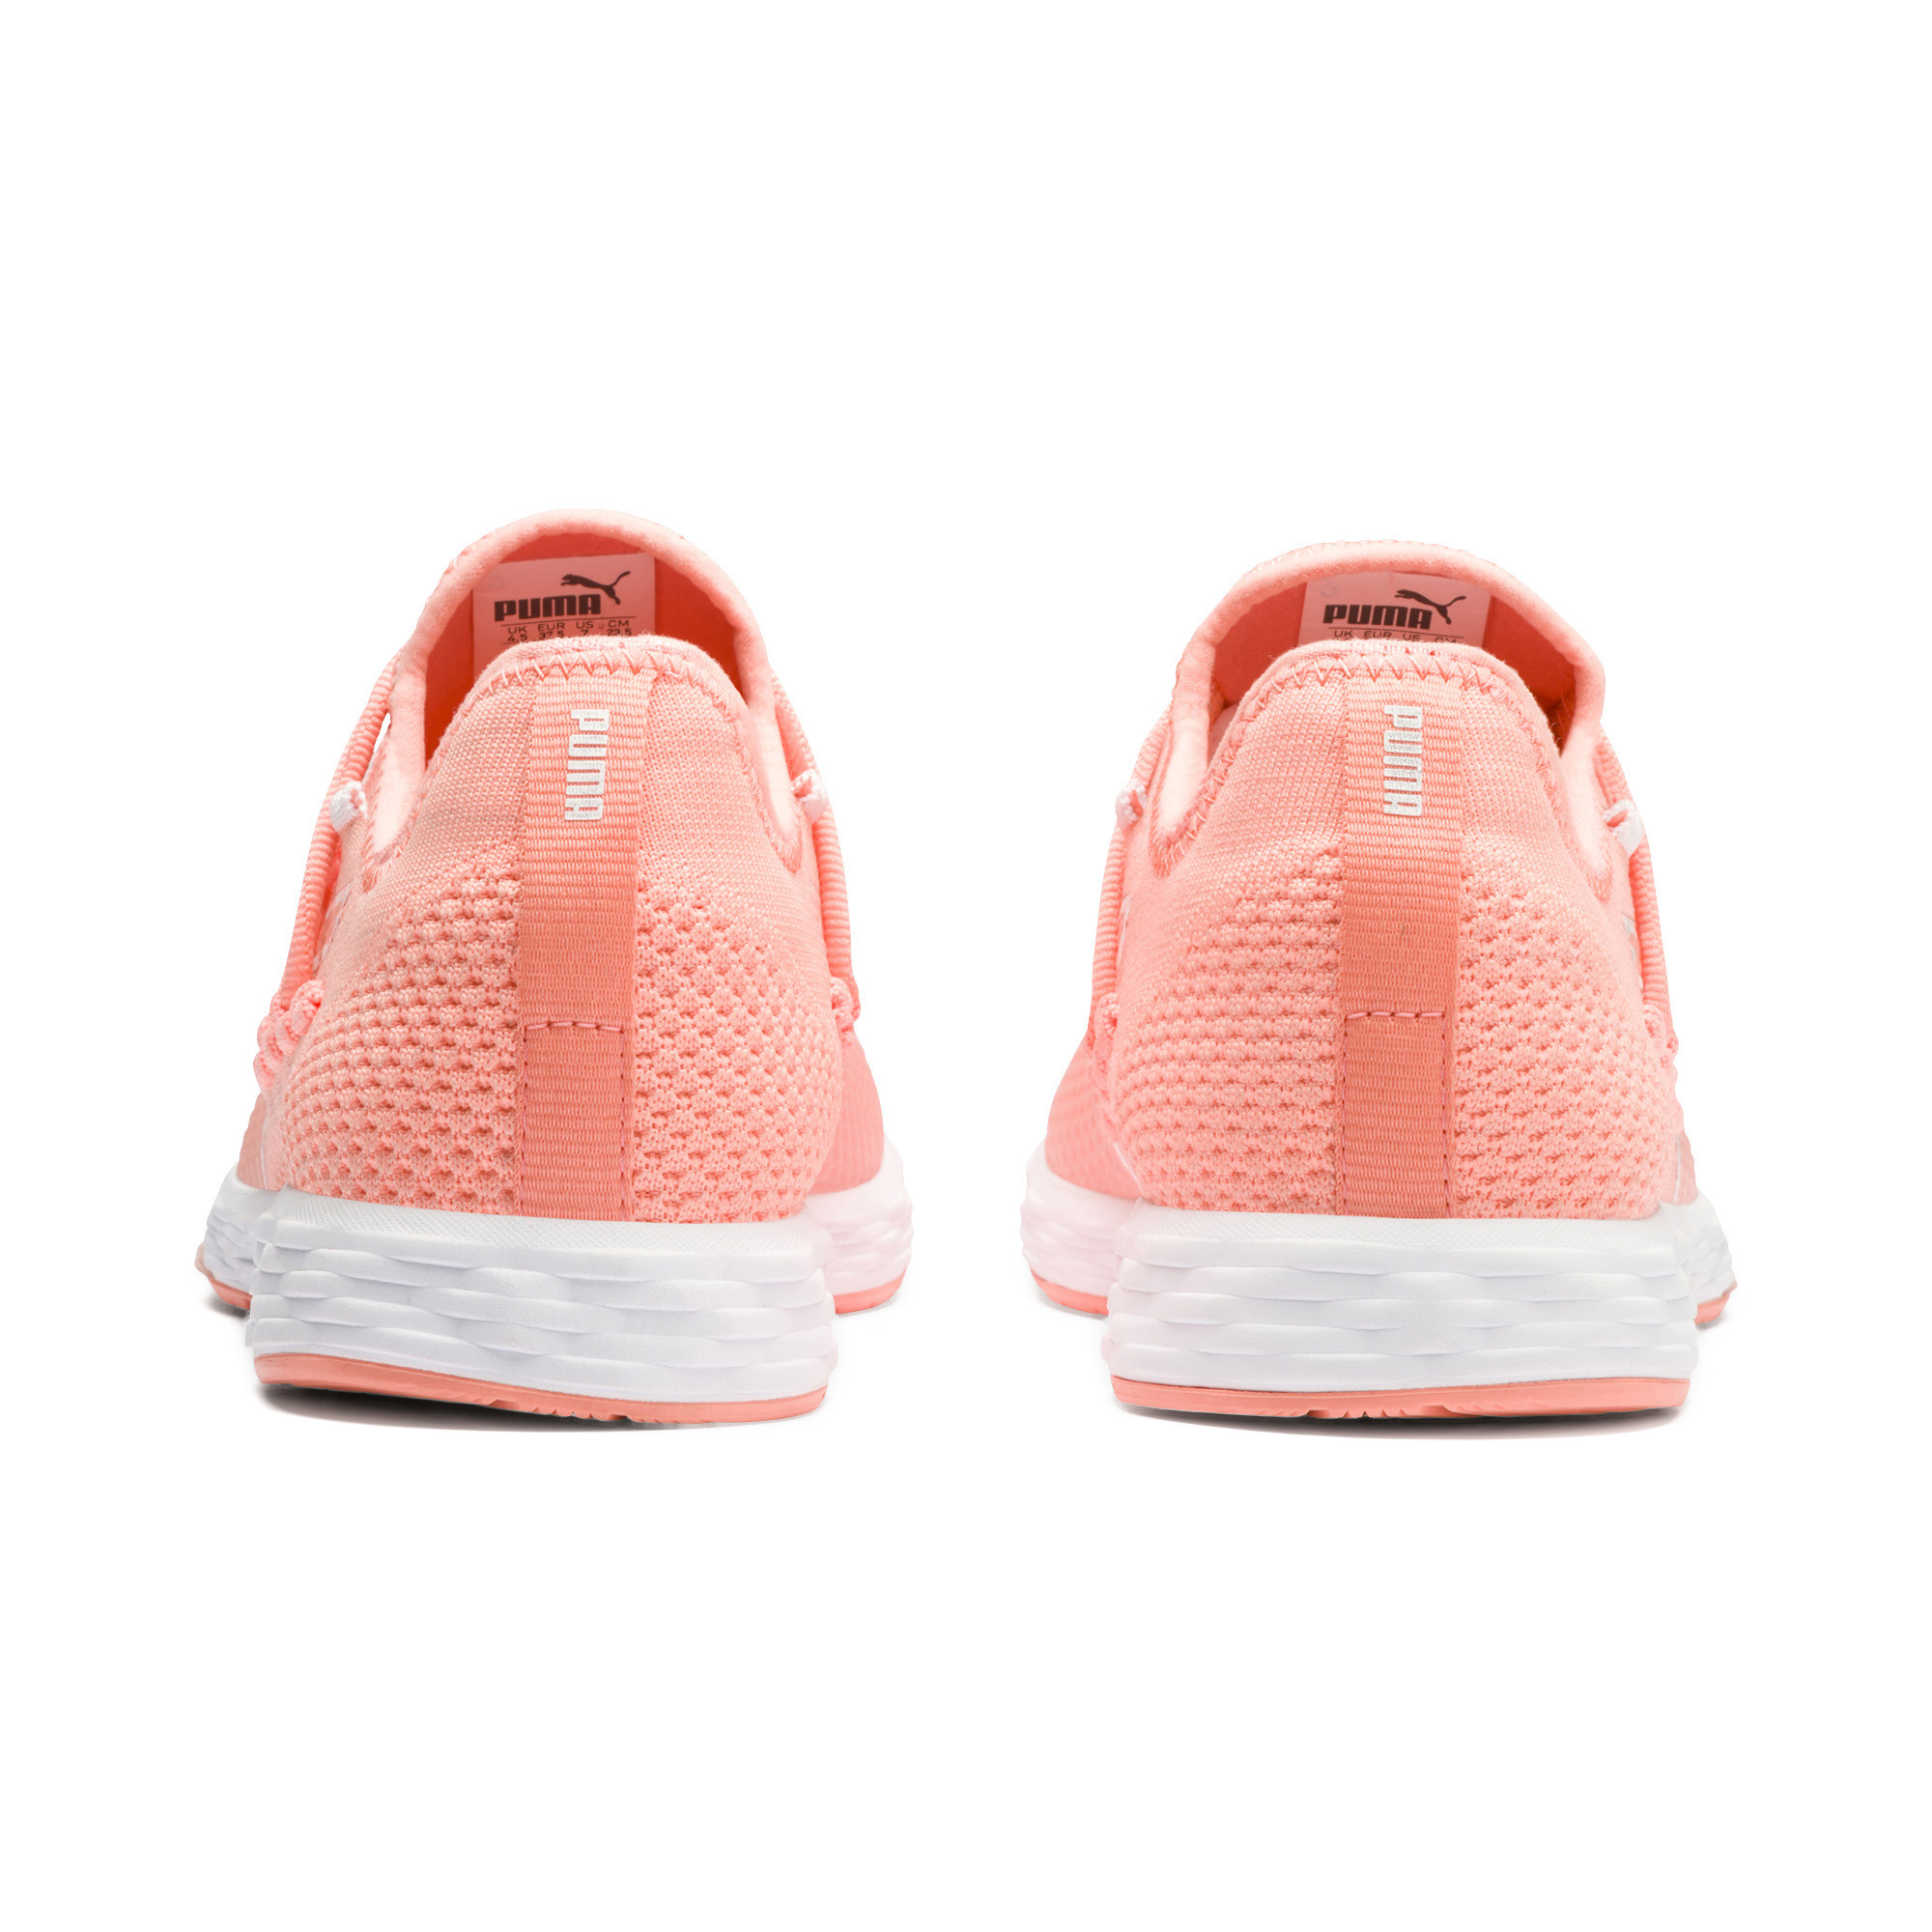 Image Puma SPEED RACER Women's Running Shoes #3